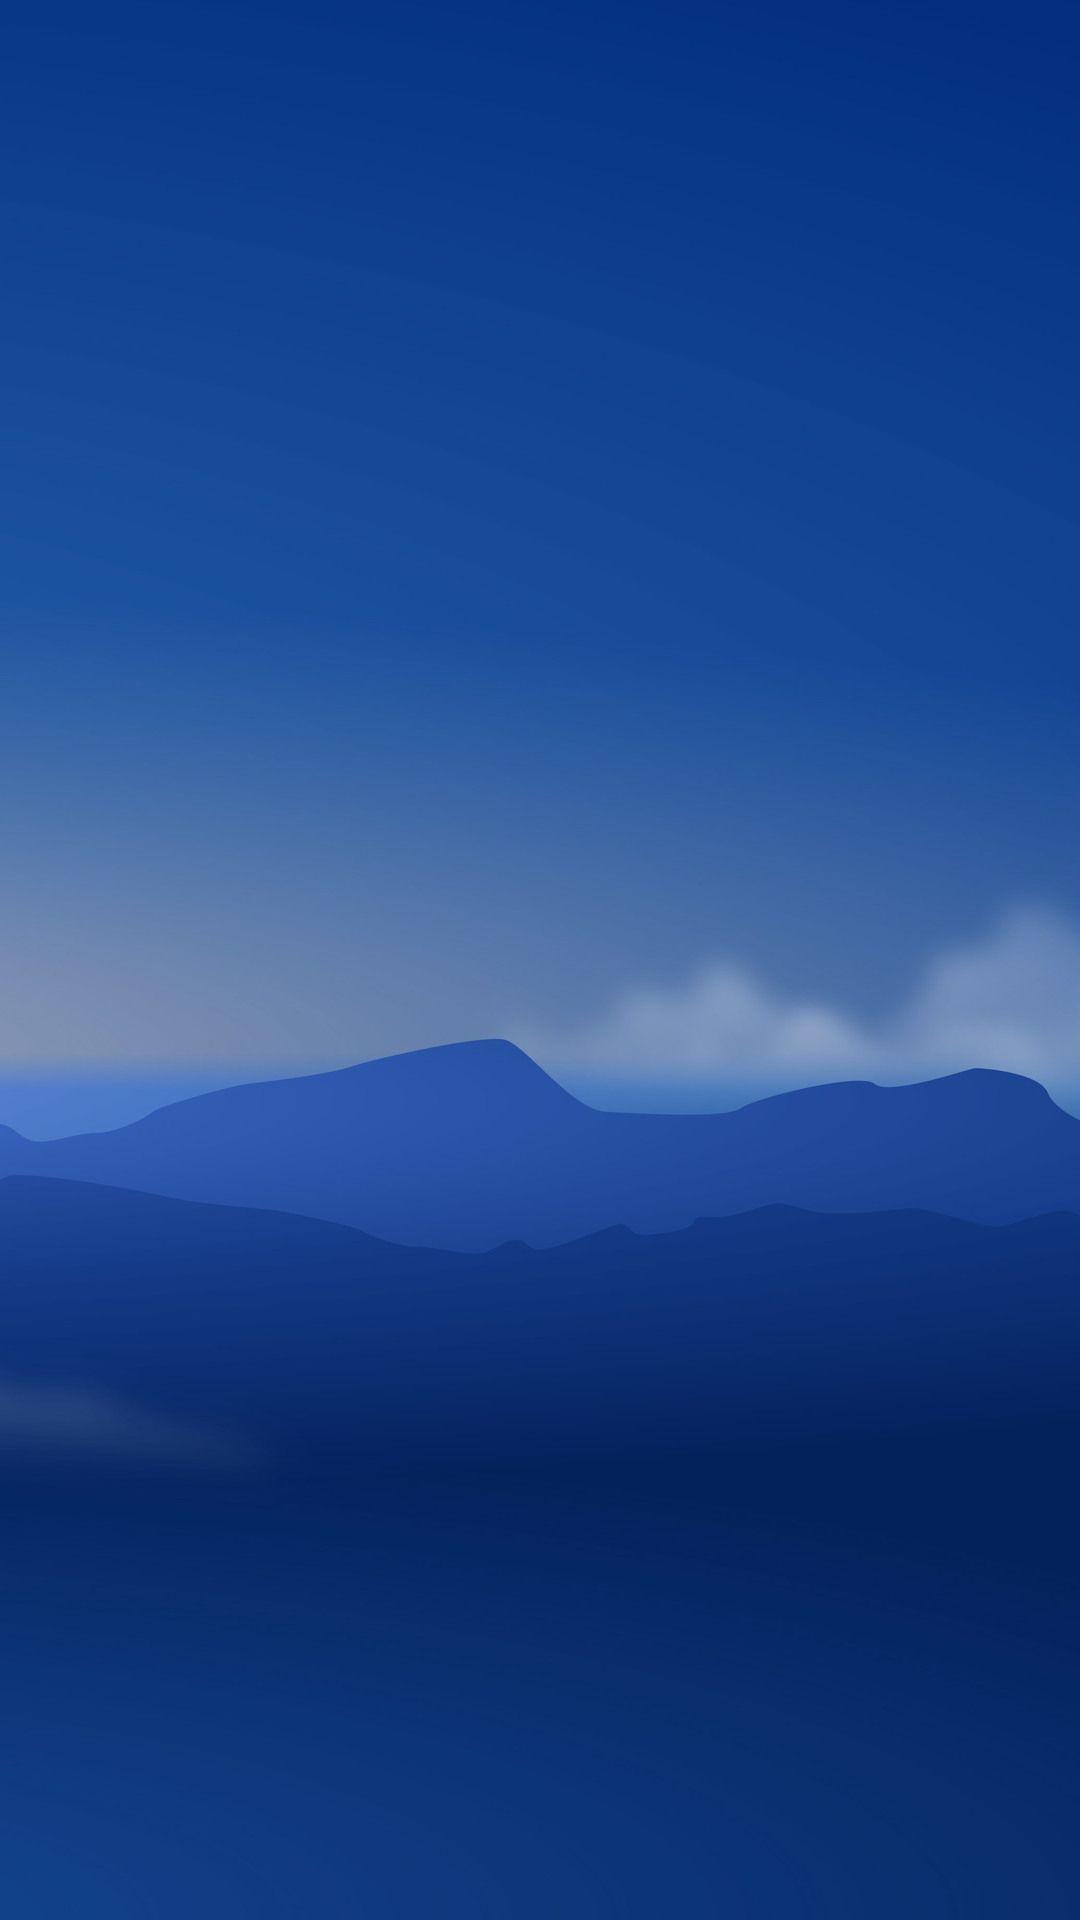 Mountains Minimalism L2 Wallpaper 1080x1920 Technology Wallpaper Color Wallpaper Iphone Wallpaper Diy Crafts